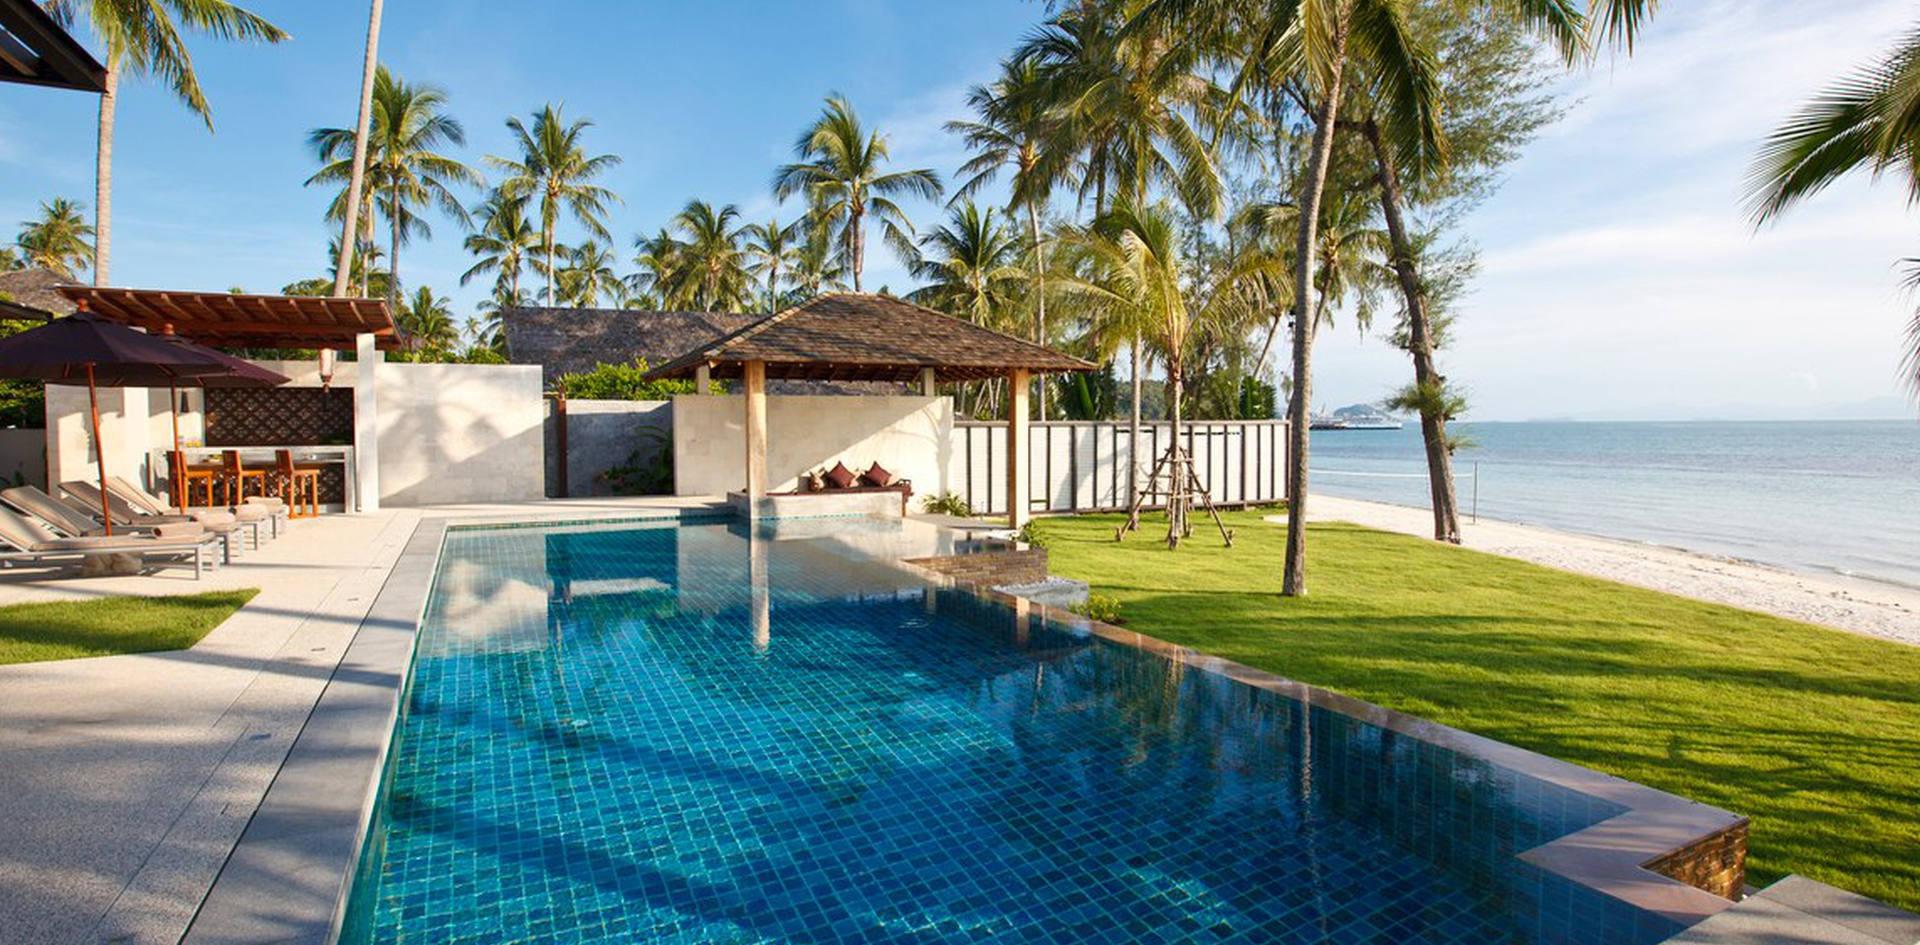 Inasia Pool - Inasia - Samui - Thailand.